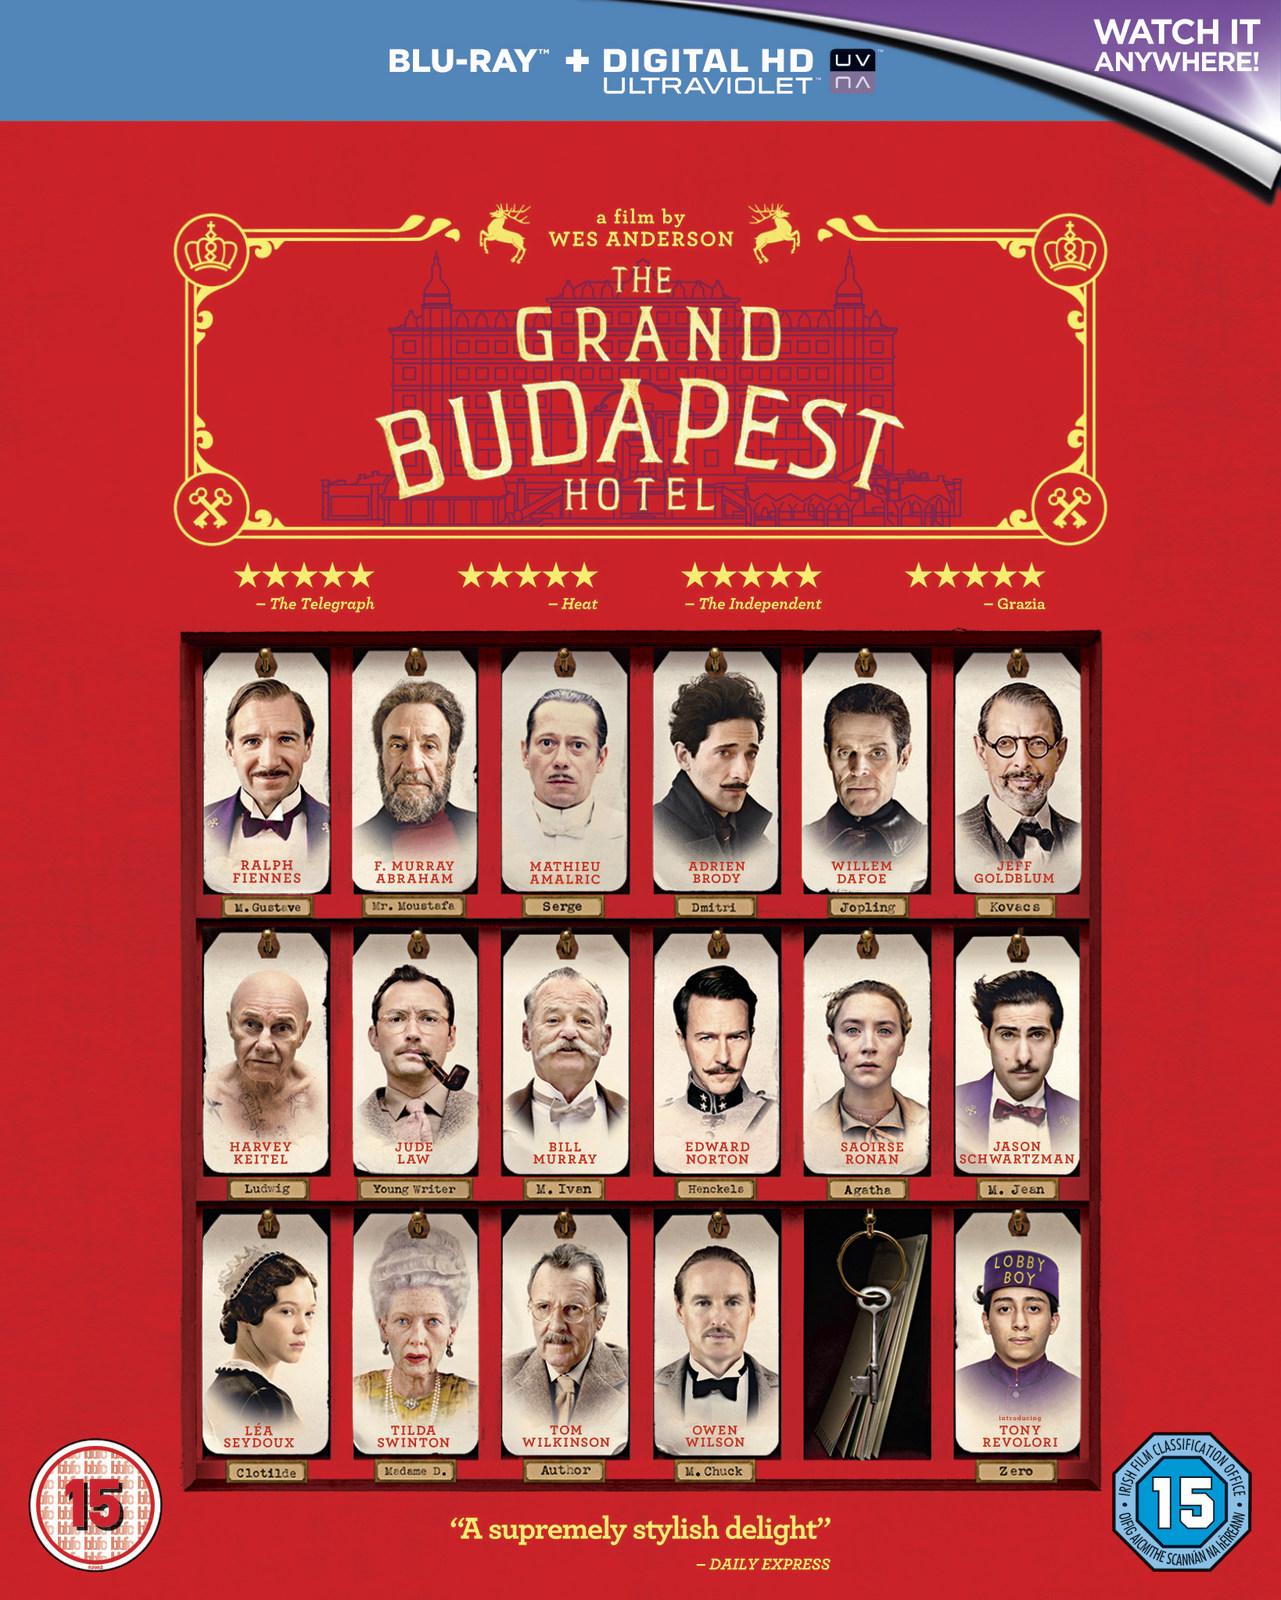 The Grand Budapest Hotel on Blu-ray, UV image